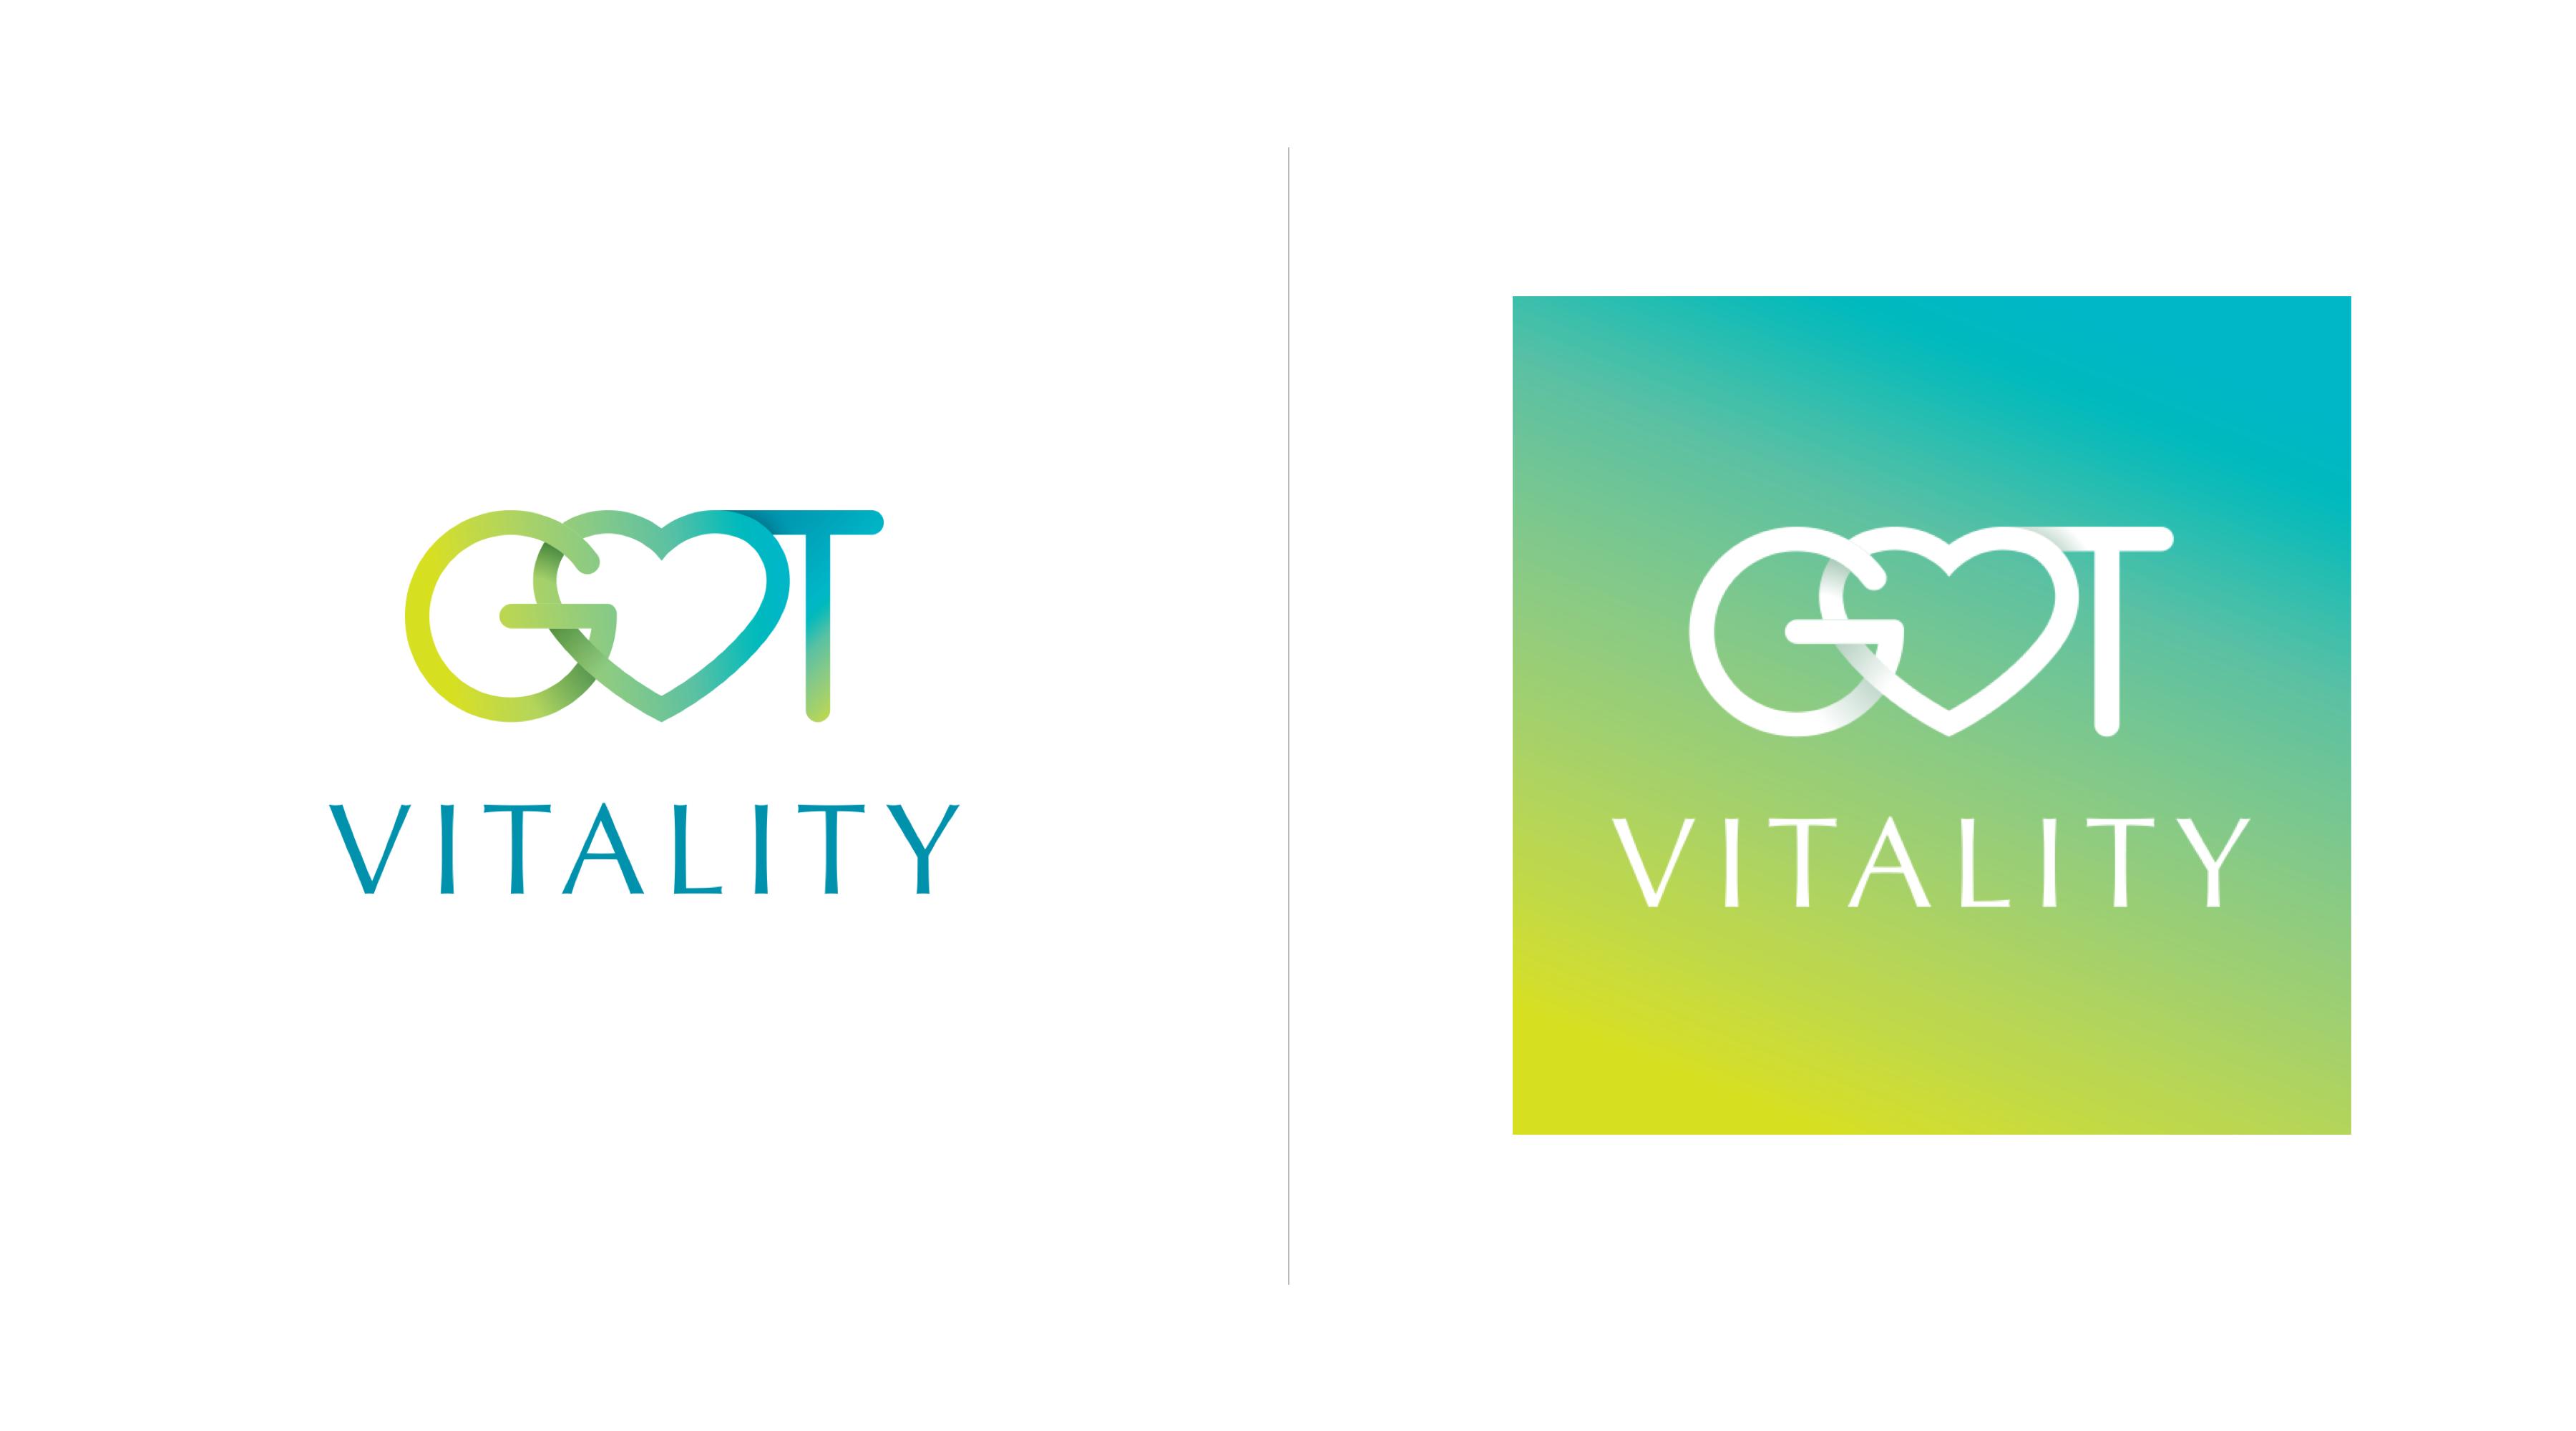 Existing Got Vitality logos